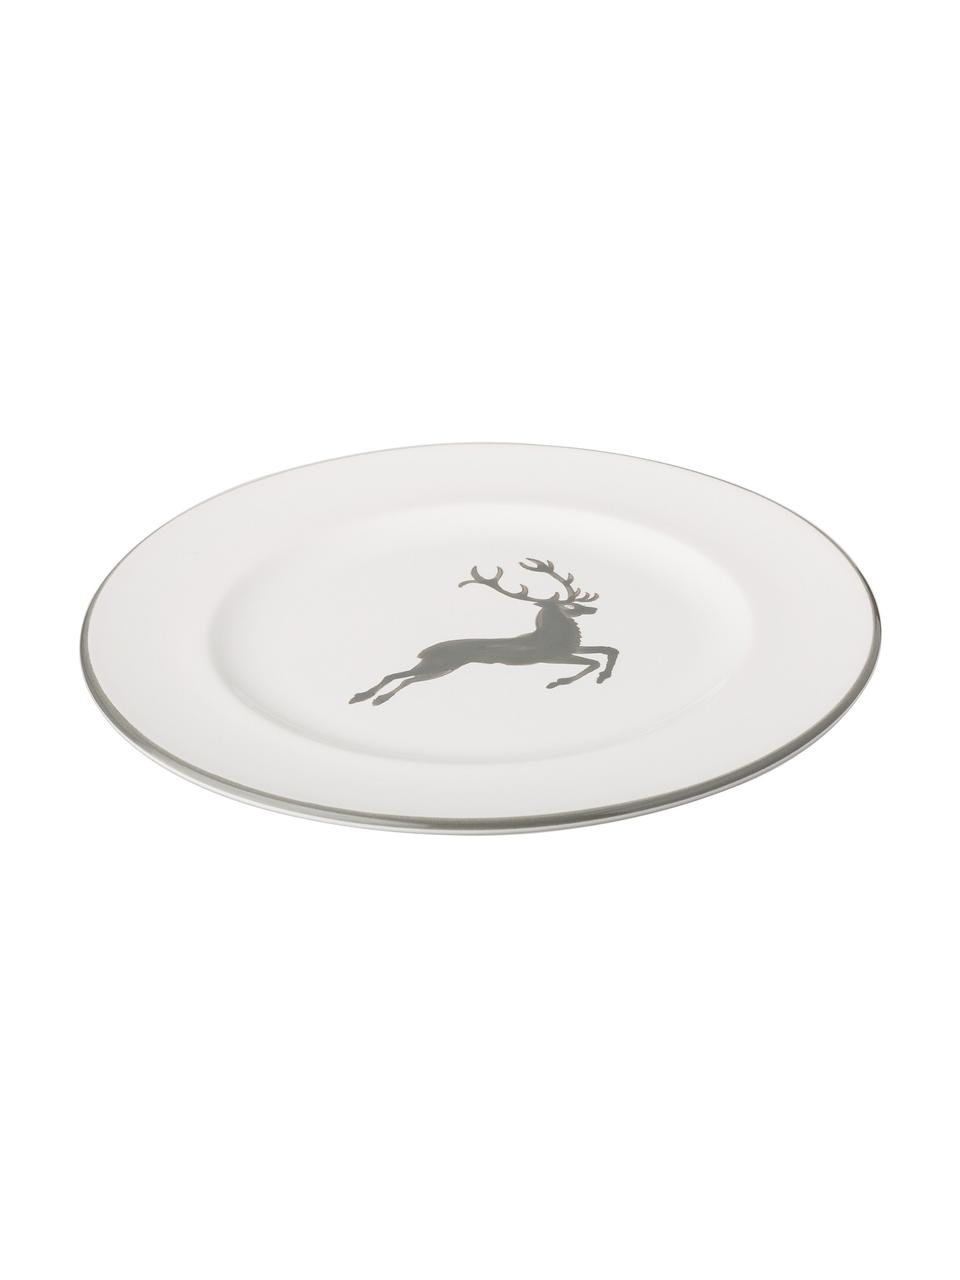 Handbeschilderd dessertbord Gourmet Grey Deer, Keramiek, Grijs, wit, Ø 22 cm